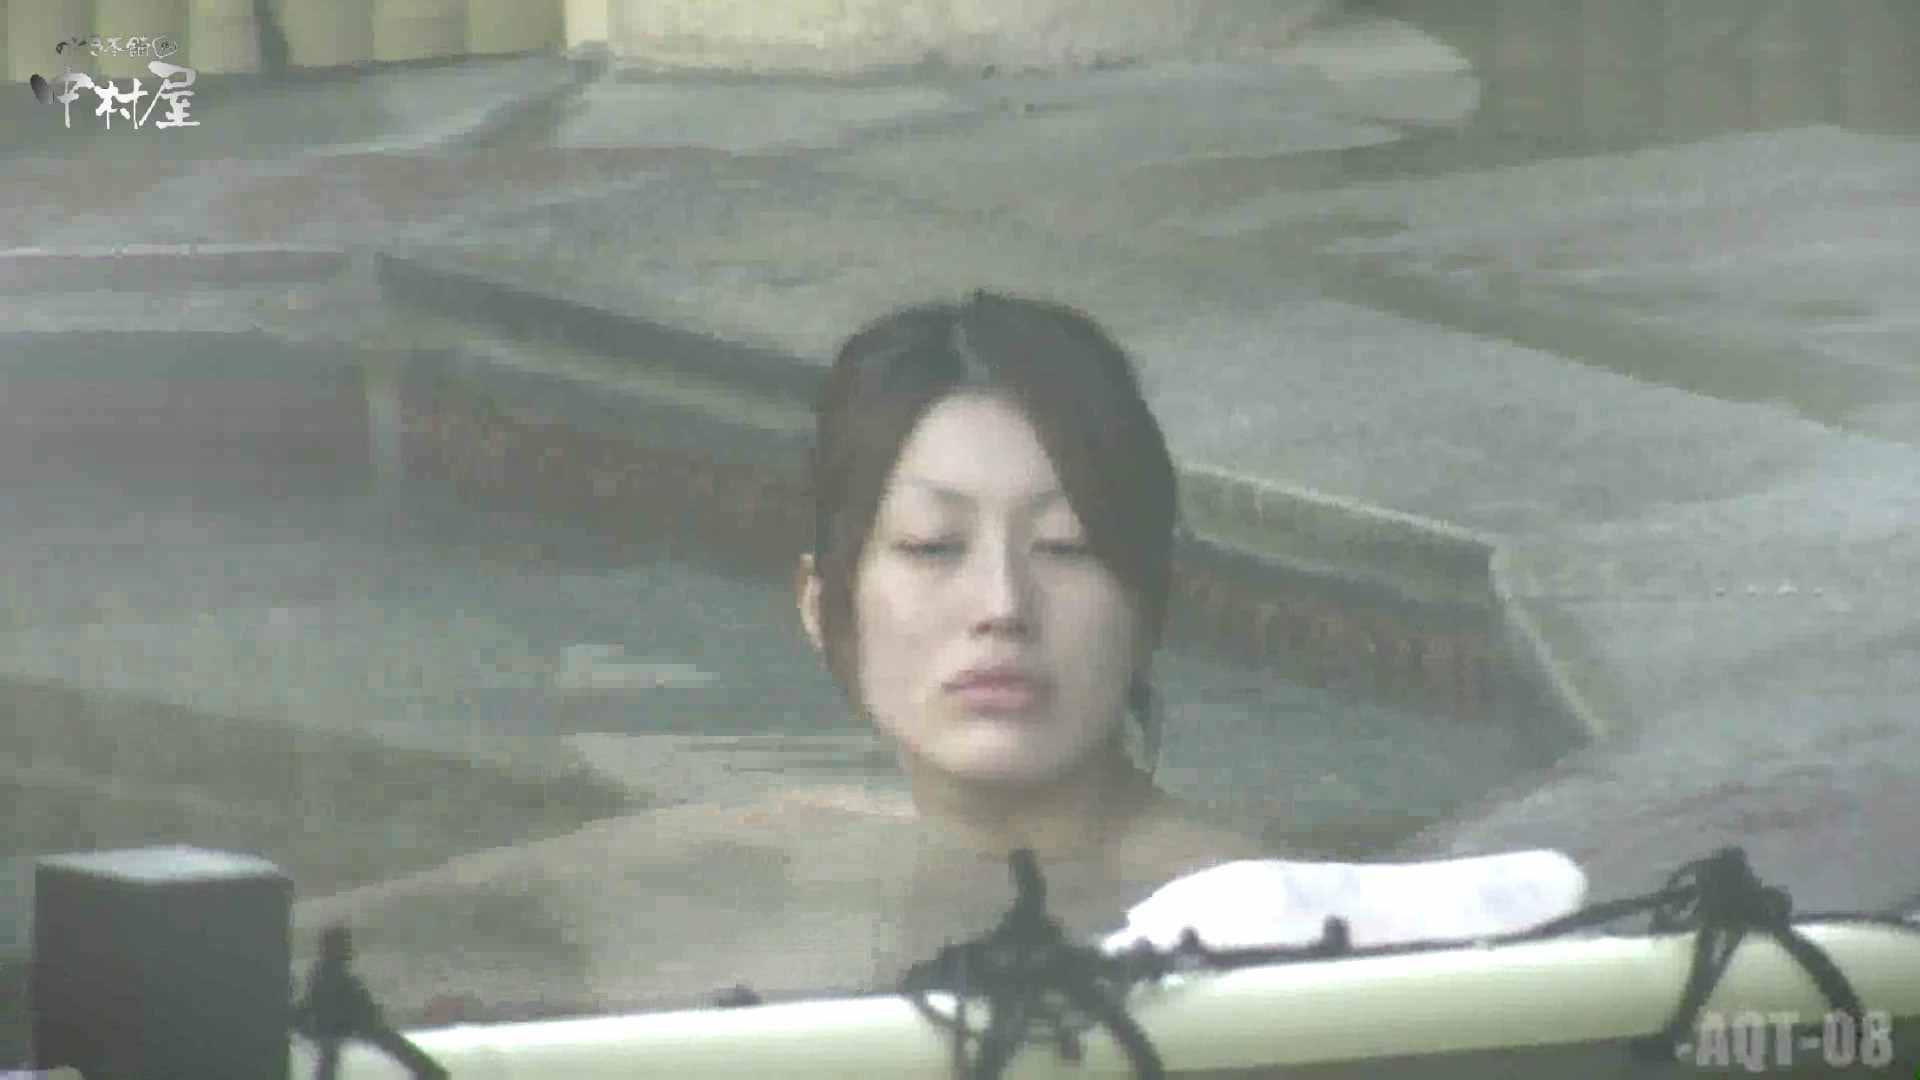 Aquaな露天風呂Vol.872潜入盗撮露天風呂八判湯 其の三 盗撮特集 | 潜入画像  96画像 69